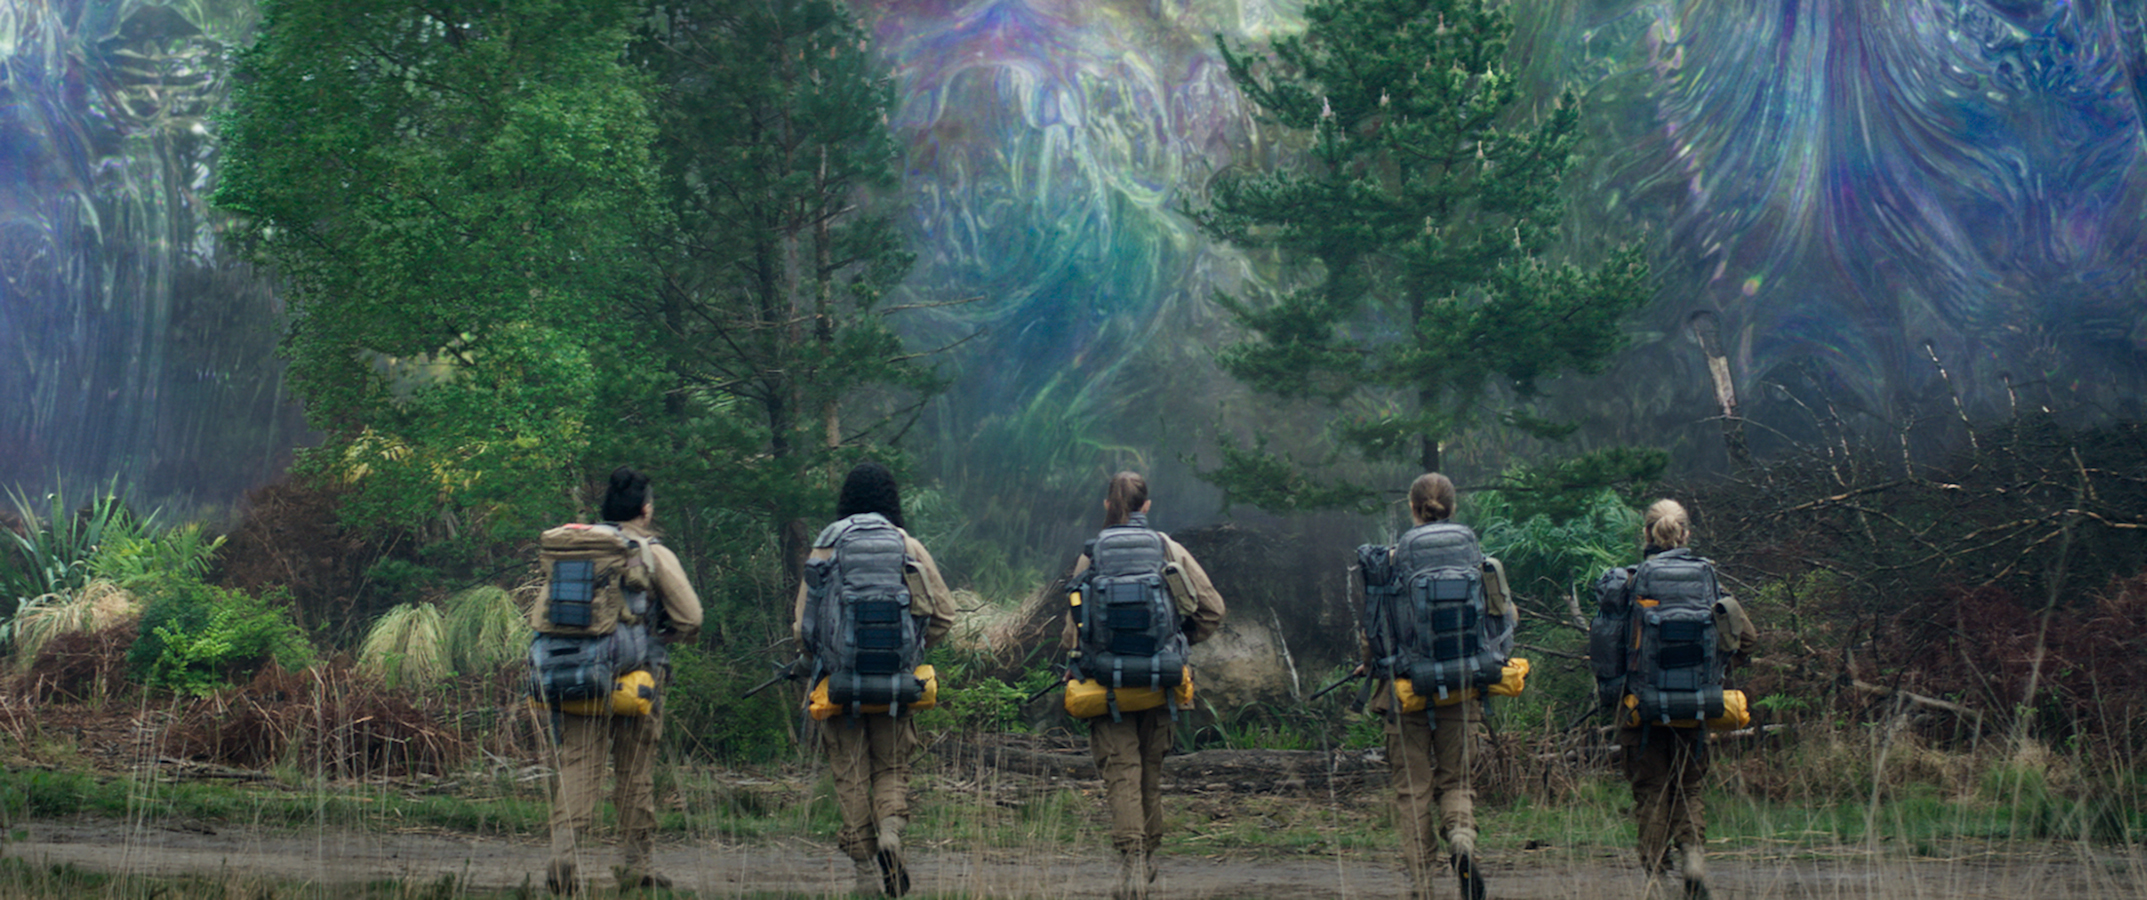 We Get More Oscar Isaac, Gina Rodriguez & Tessa Thompson in Terrifying New 'Annihilation' Trailer